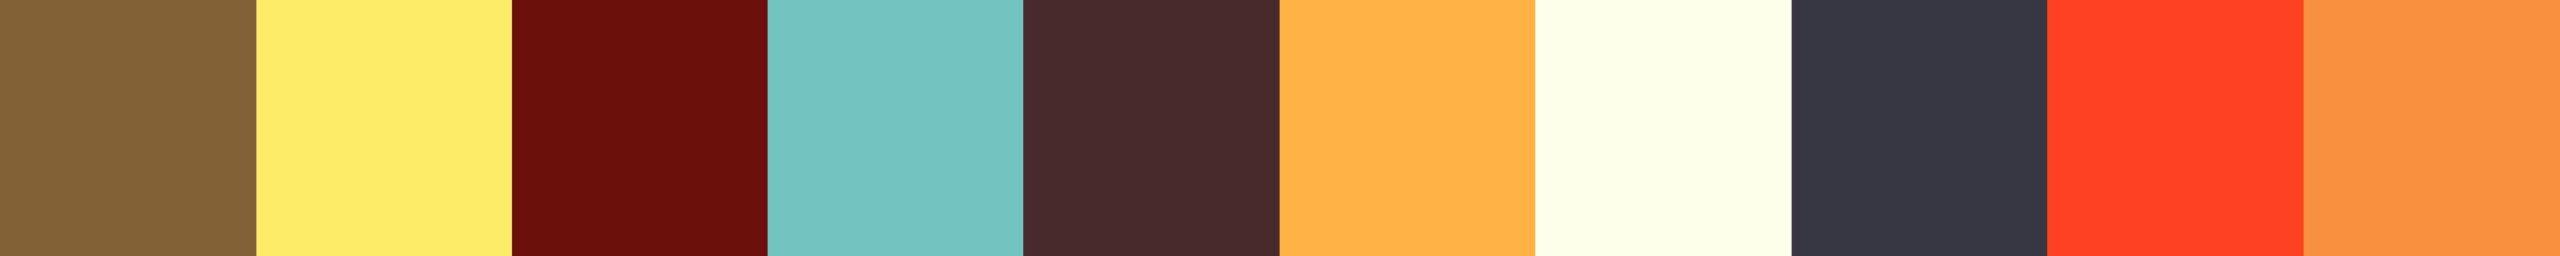 621 Fermaniona Color Palette